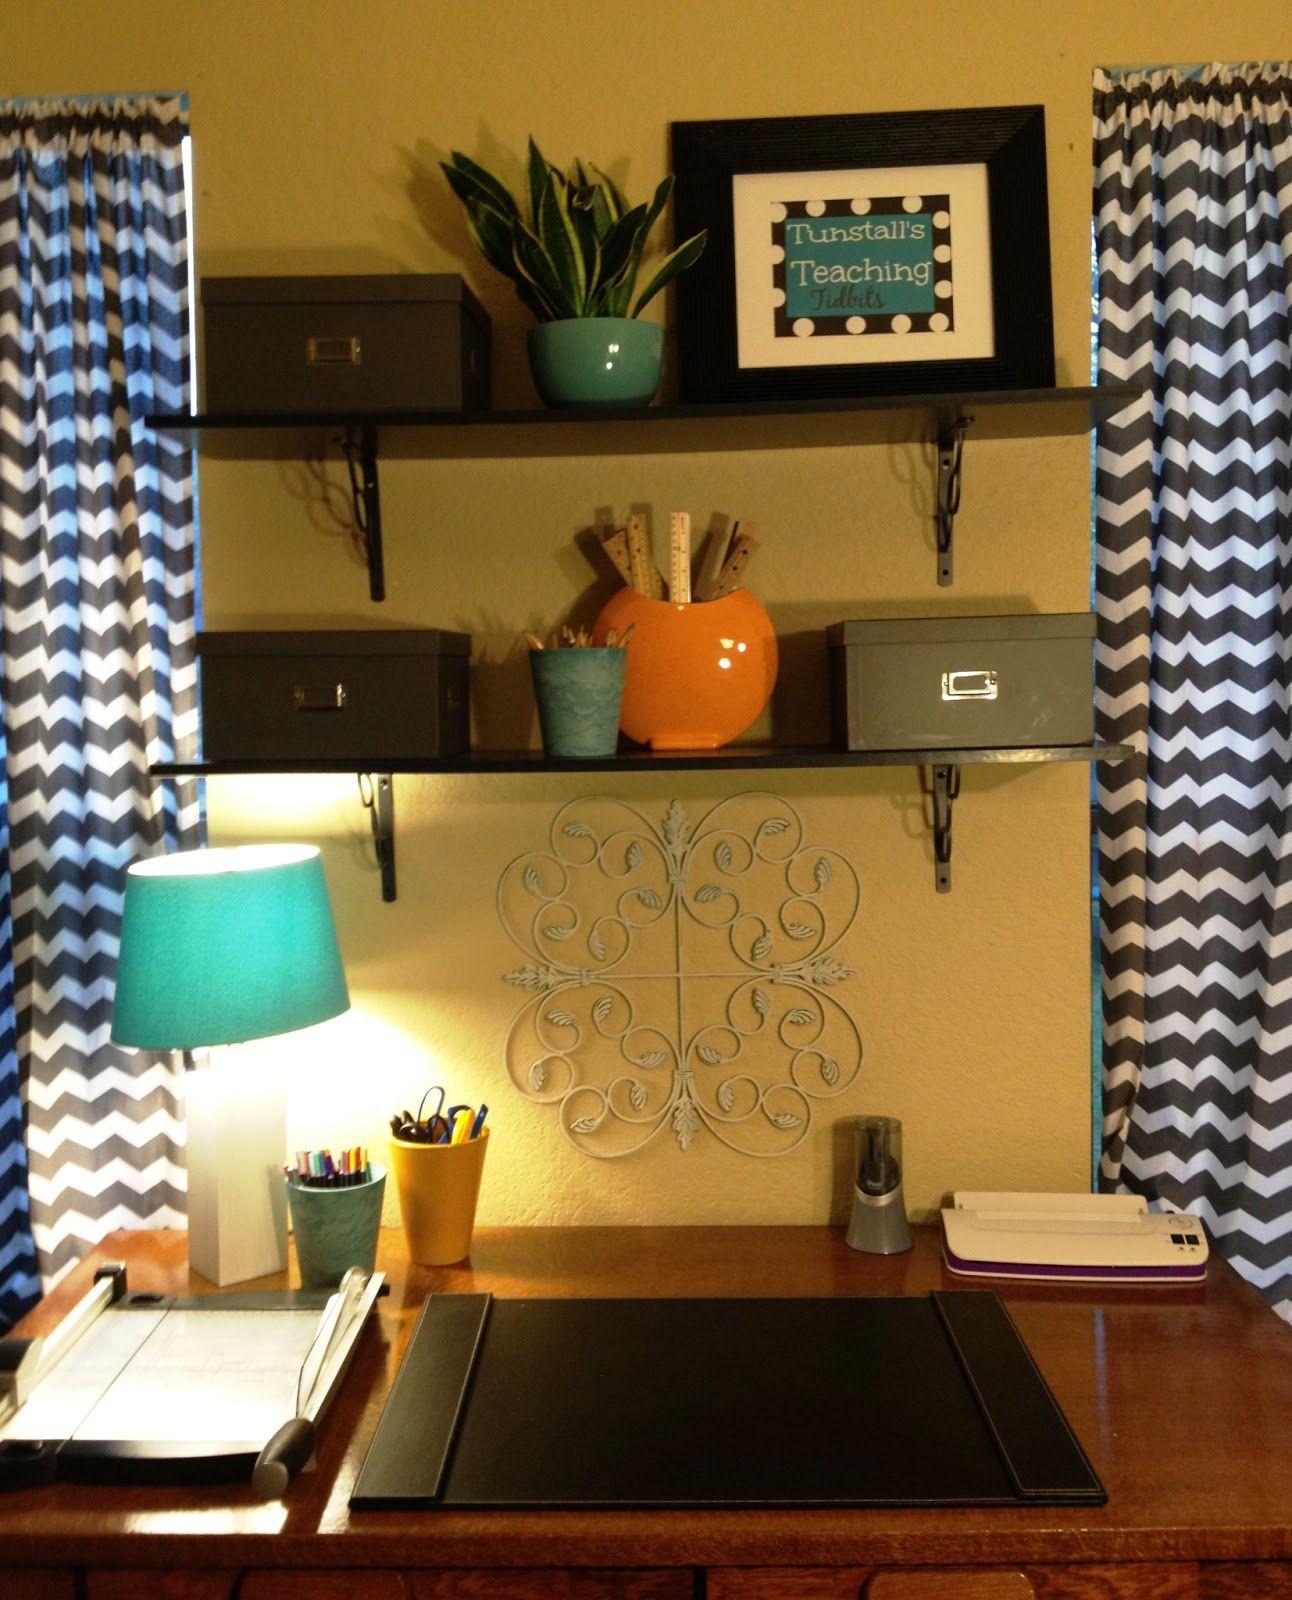 Home Office Makeover Reveal--My teacher heaven | Top Teachers ...